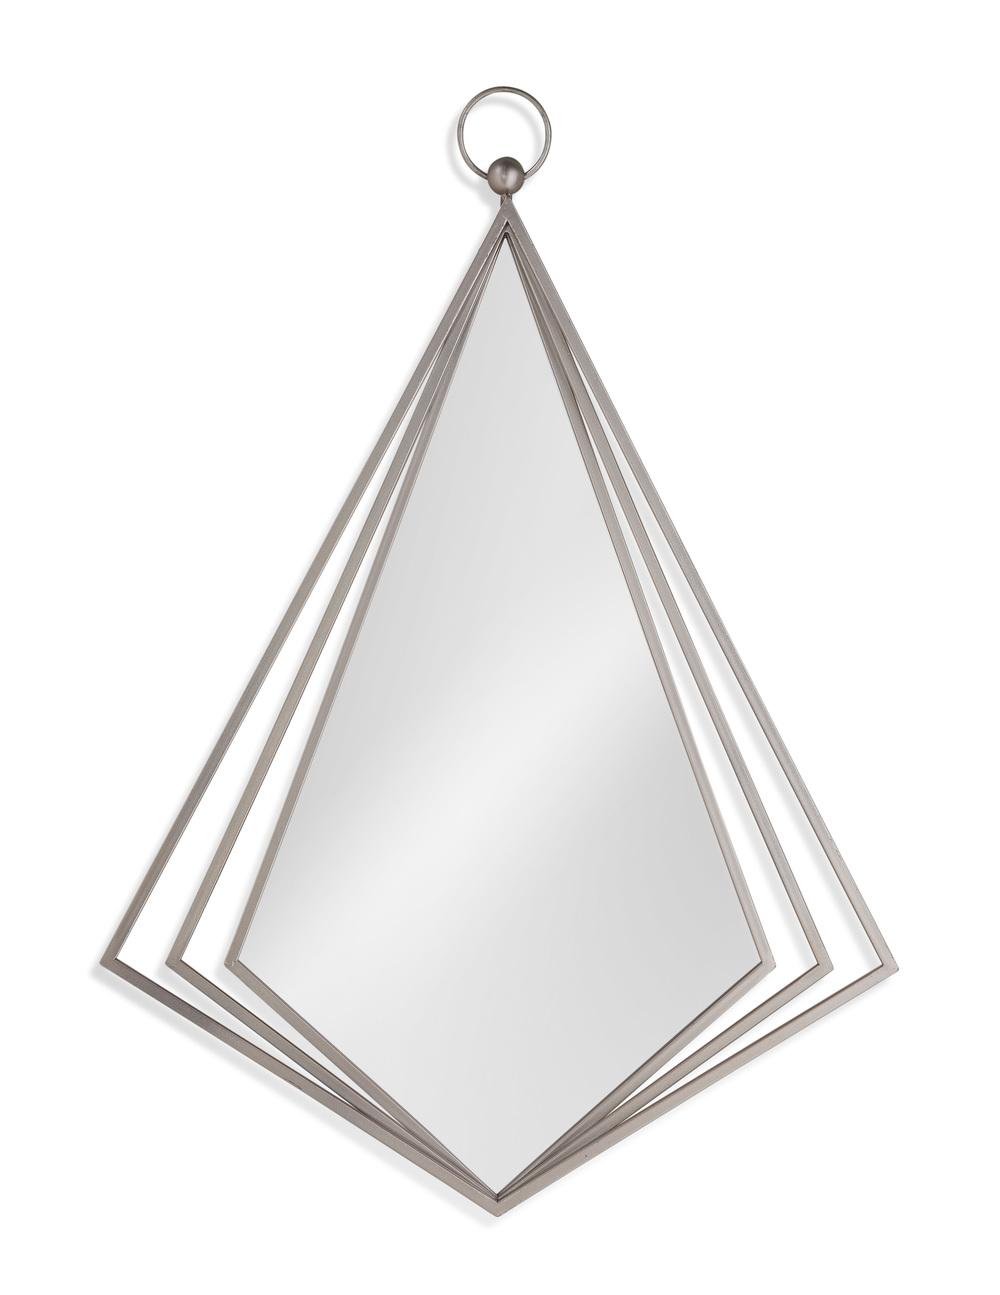 Bassett Mirror Company - Chanda Wall Mirror